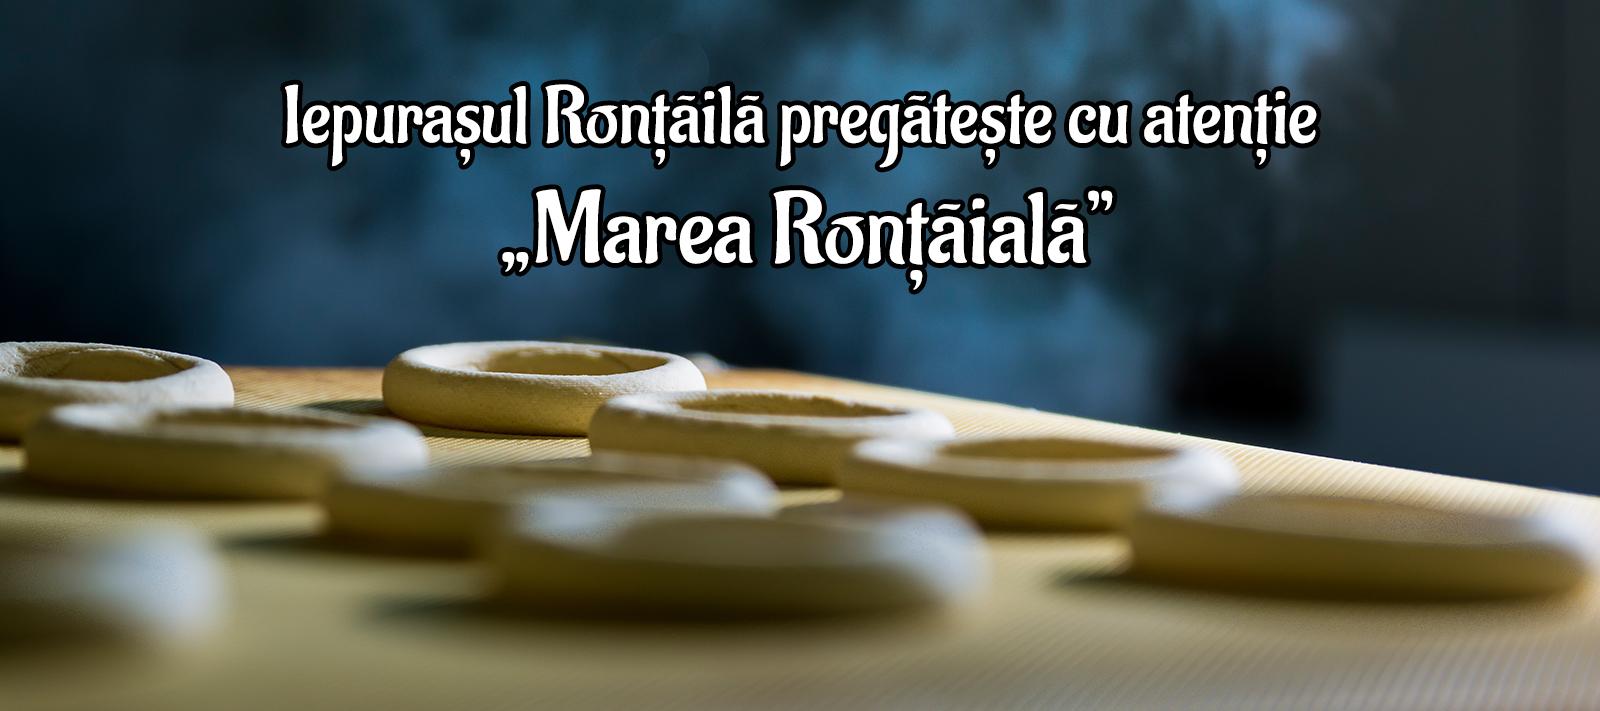 Covrigei sarati Rontaila - banner 4